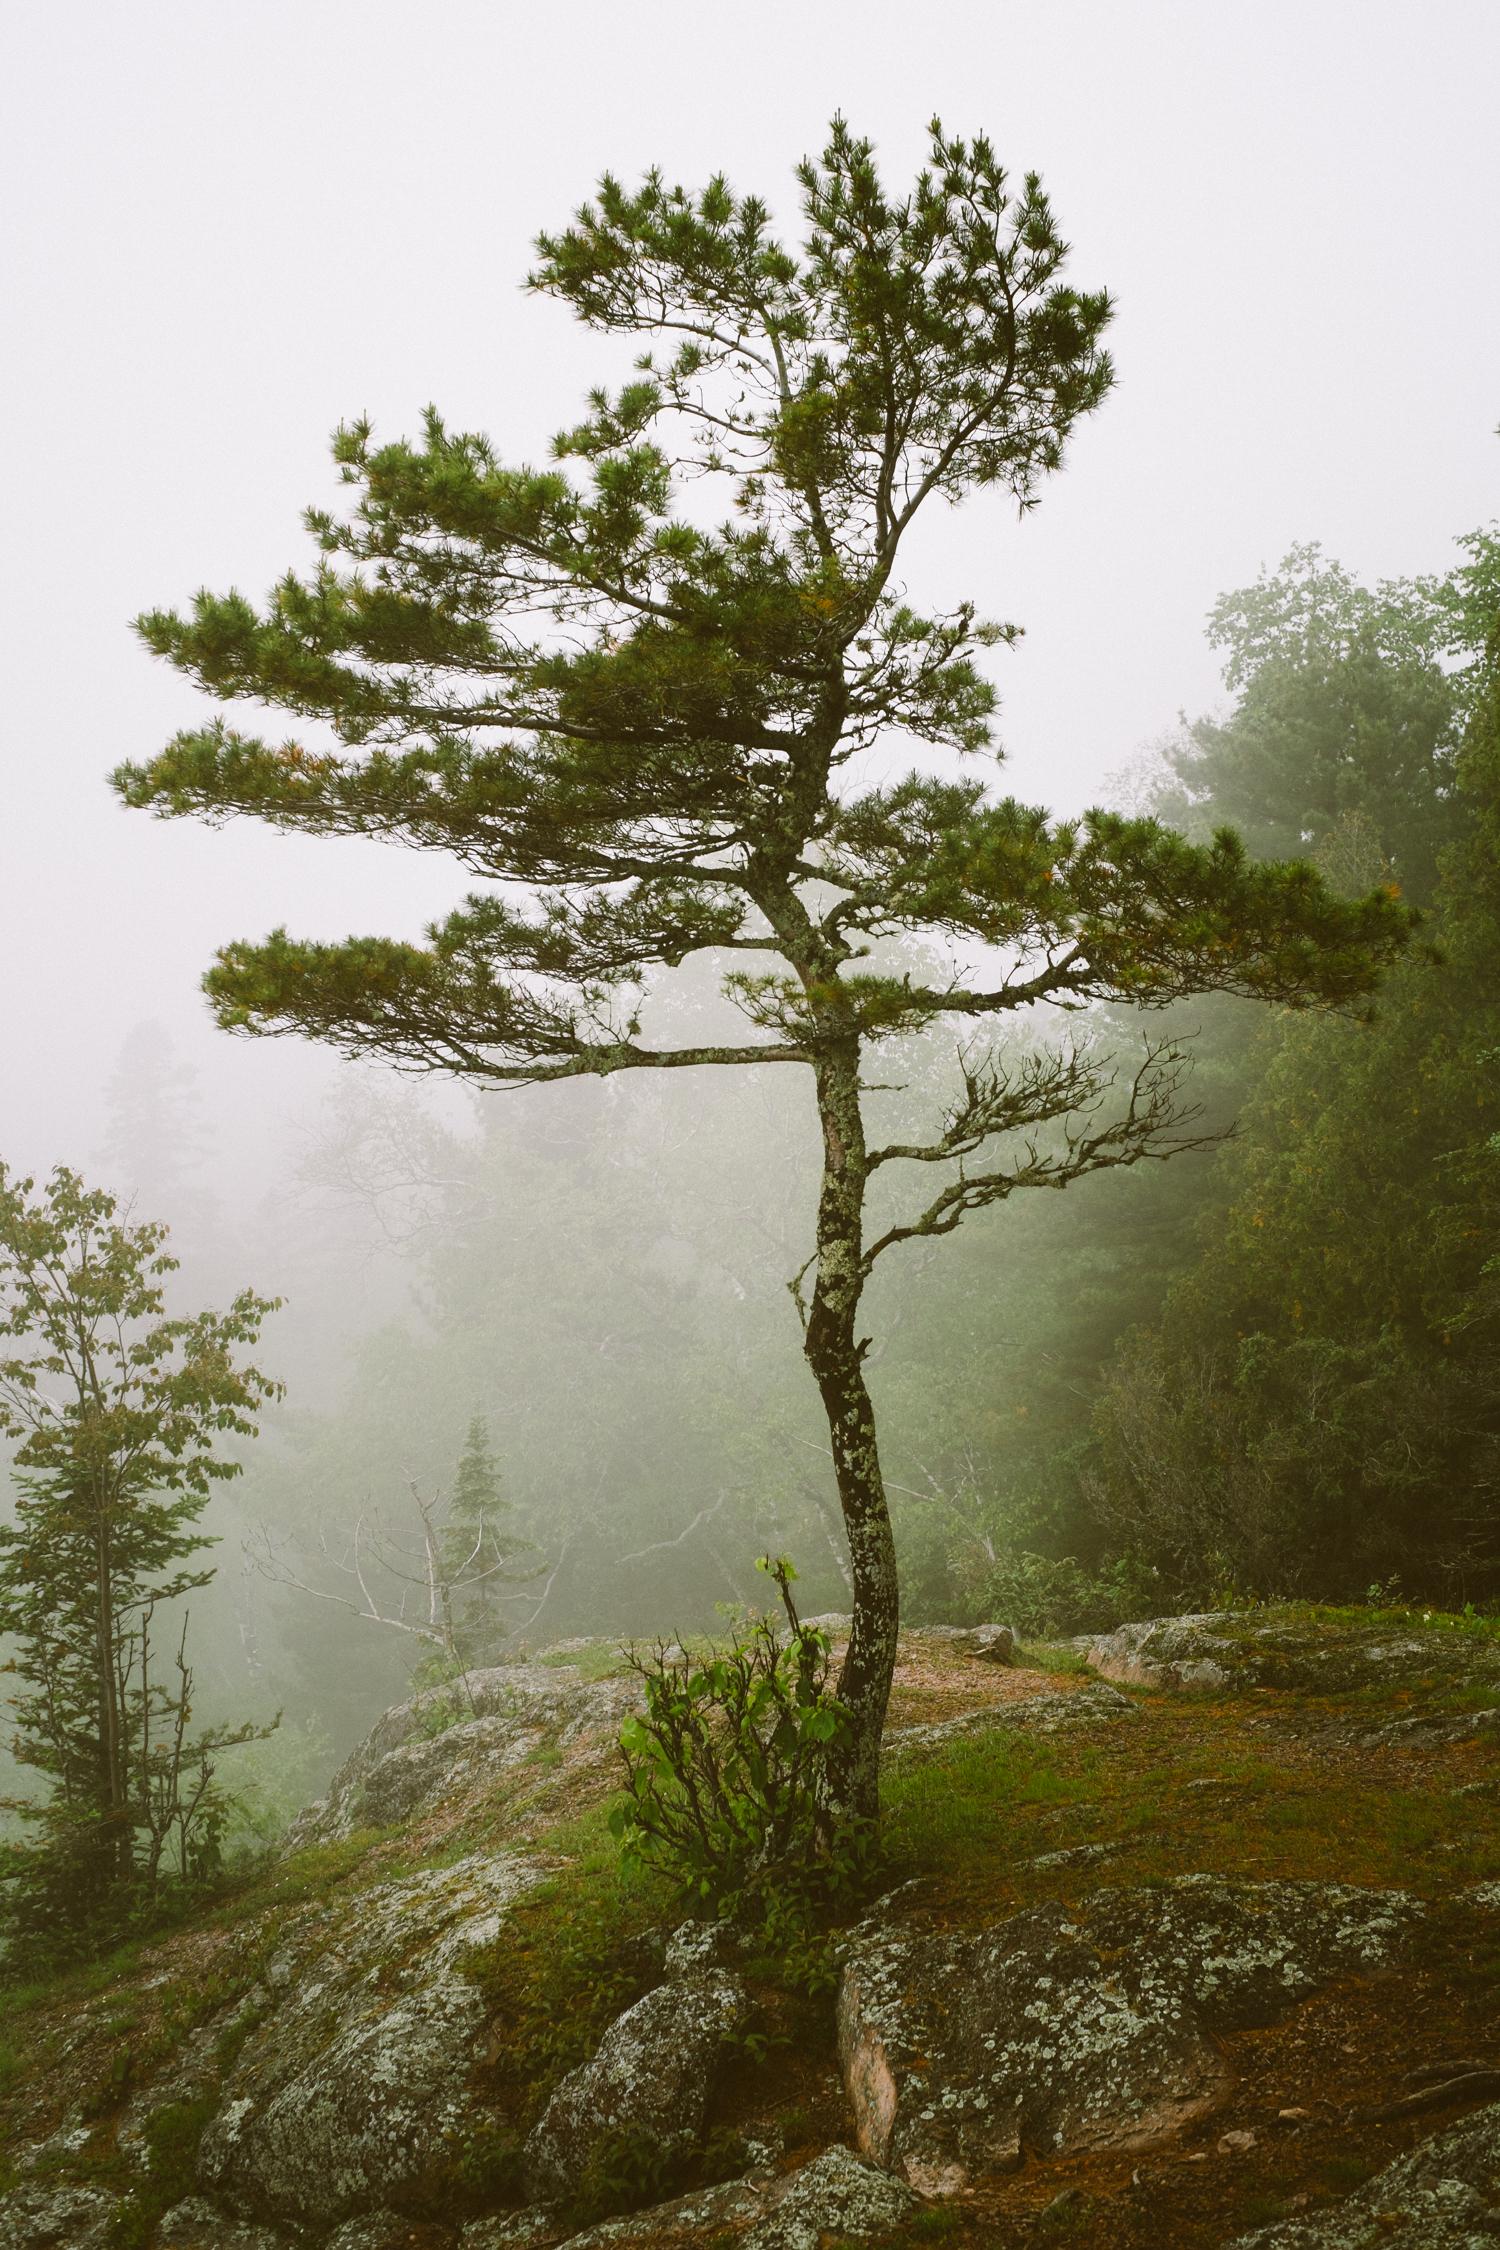 Tettegouche State Park